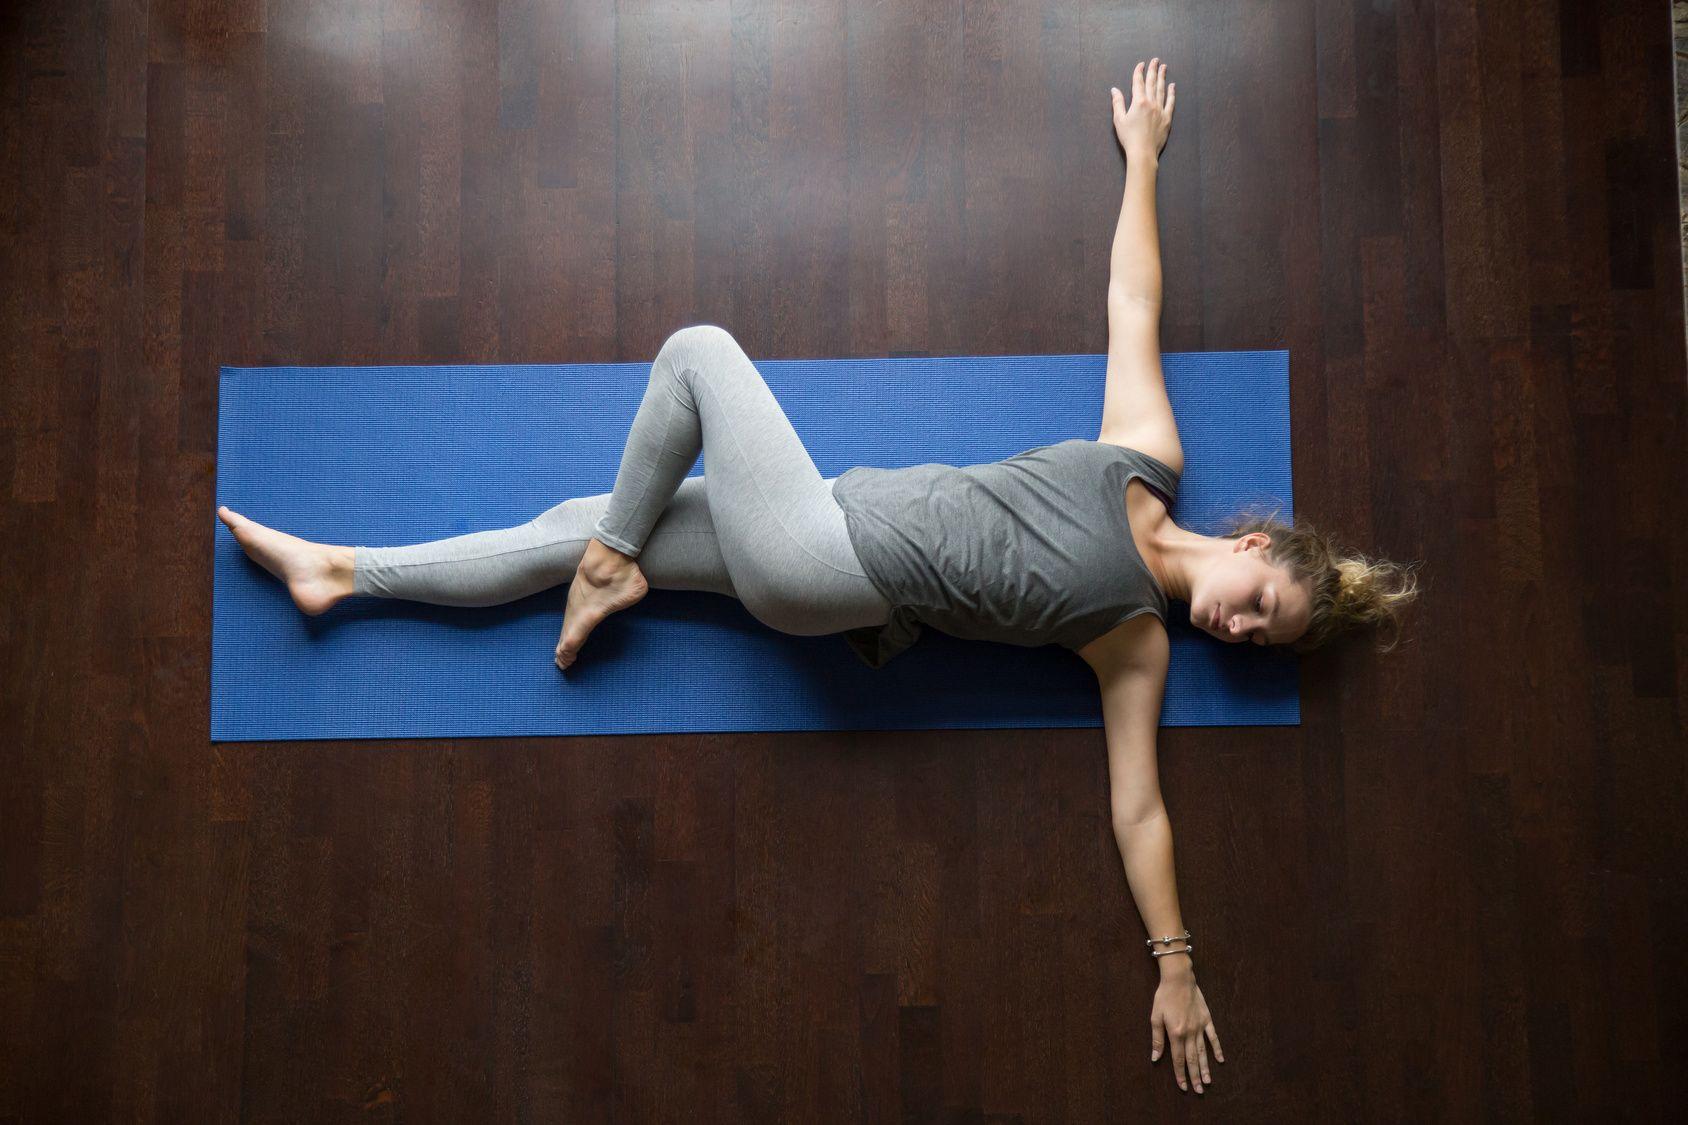 gimnastyka kręgosłupa - skręt